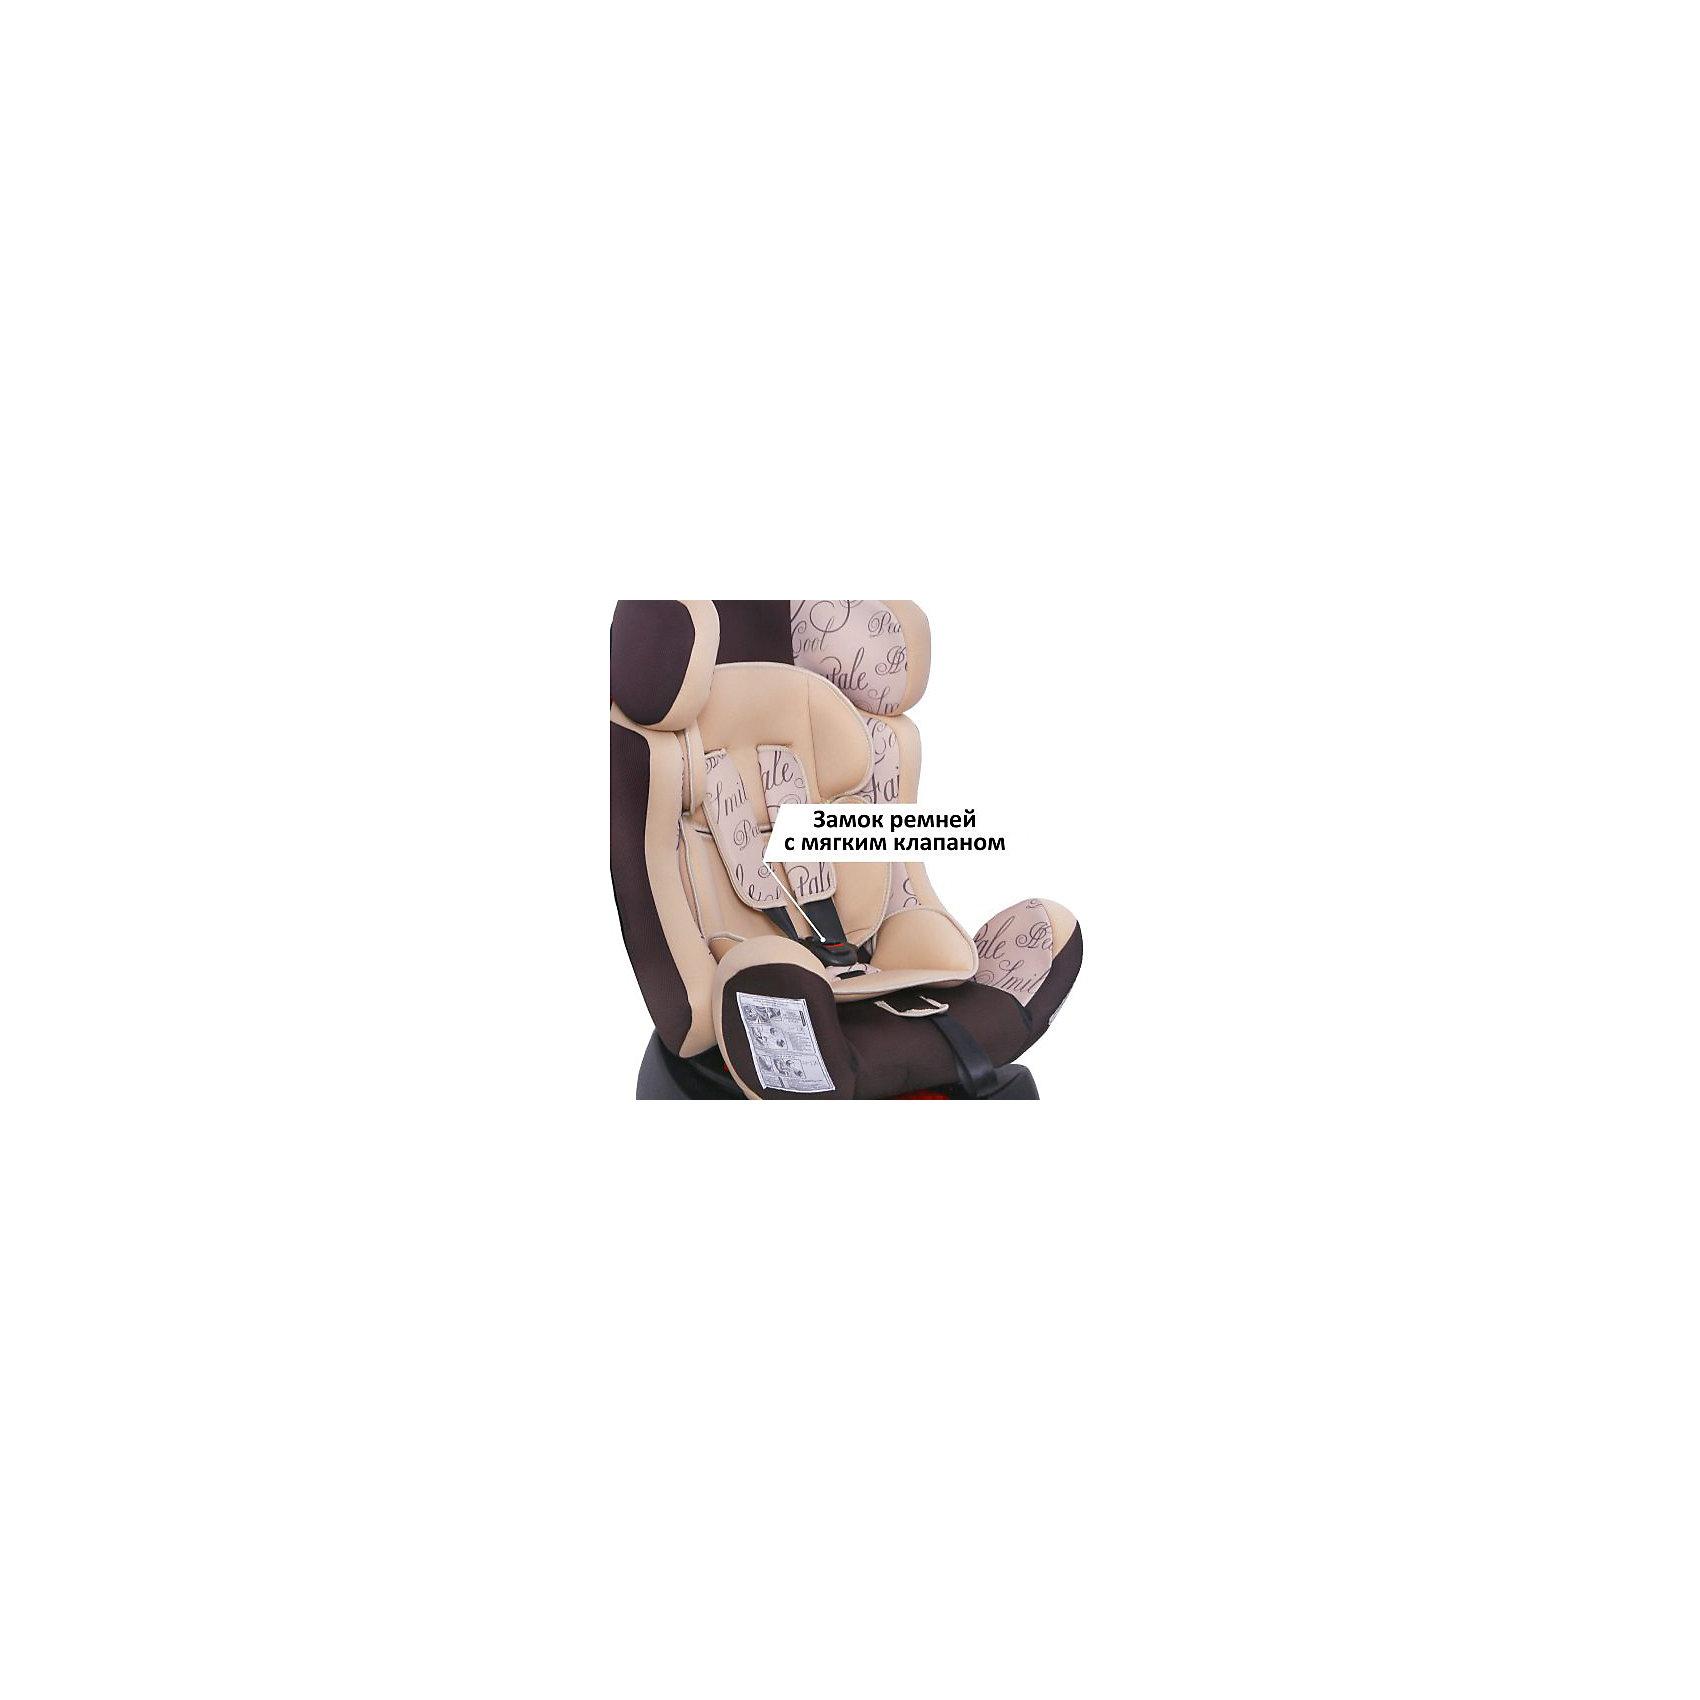 Автокресло Siger Art Диона 0-25 кг, сказка от myToys